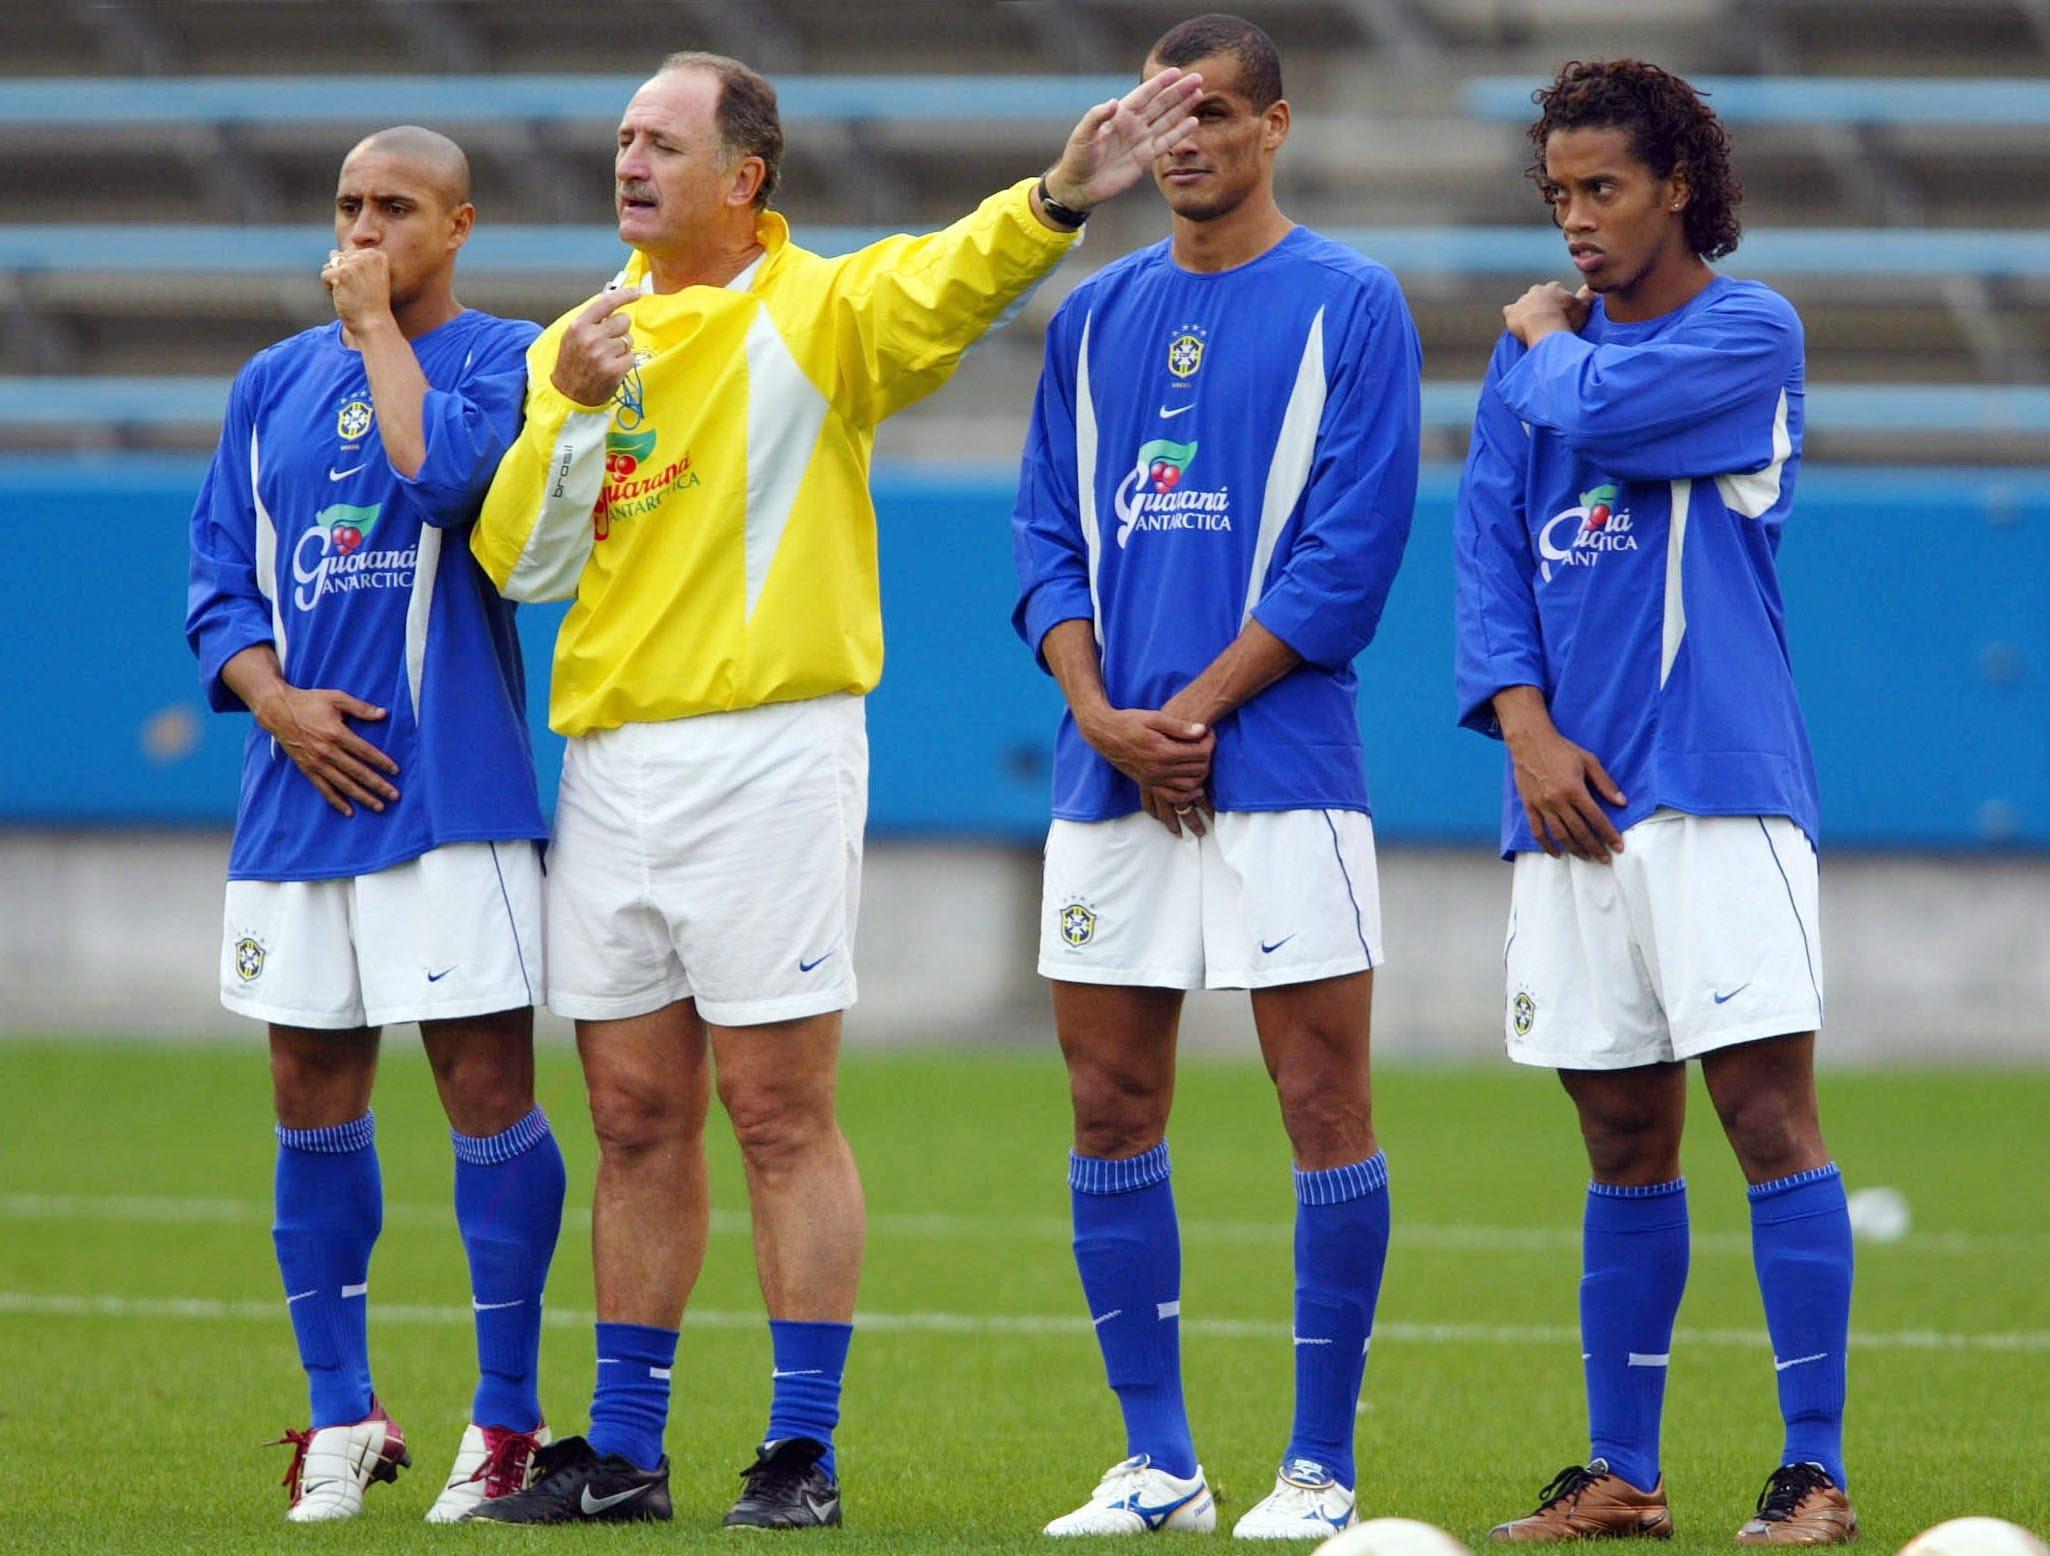 Roberto Carlos, Scolari,Rivaldo and Ronaldinho